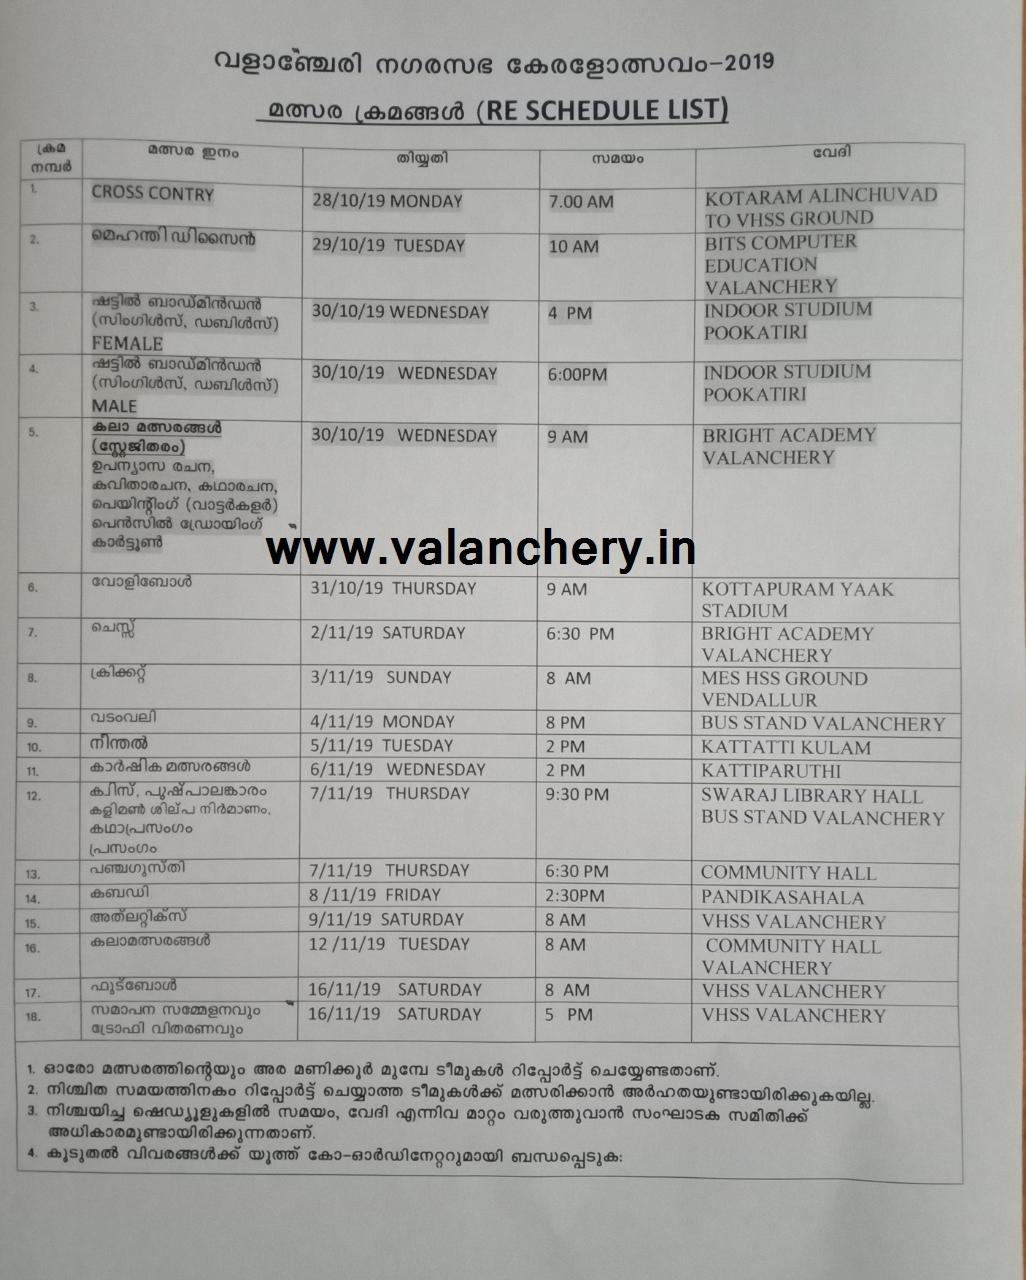 valanchery-keralotsavam-reschedule